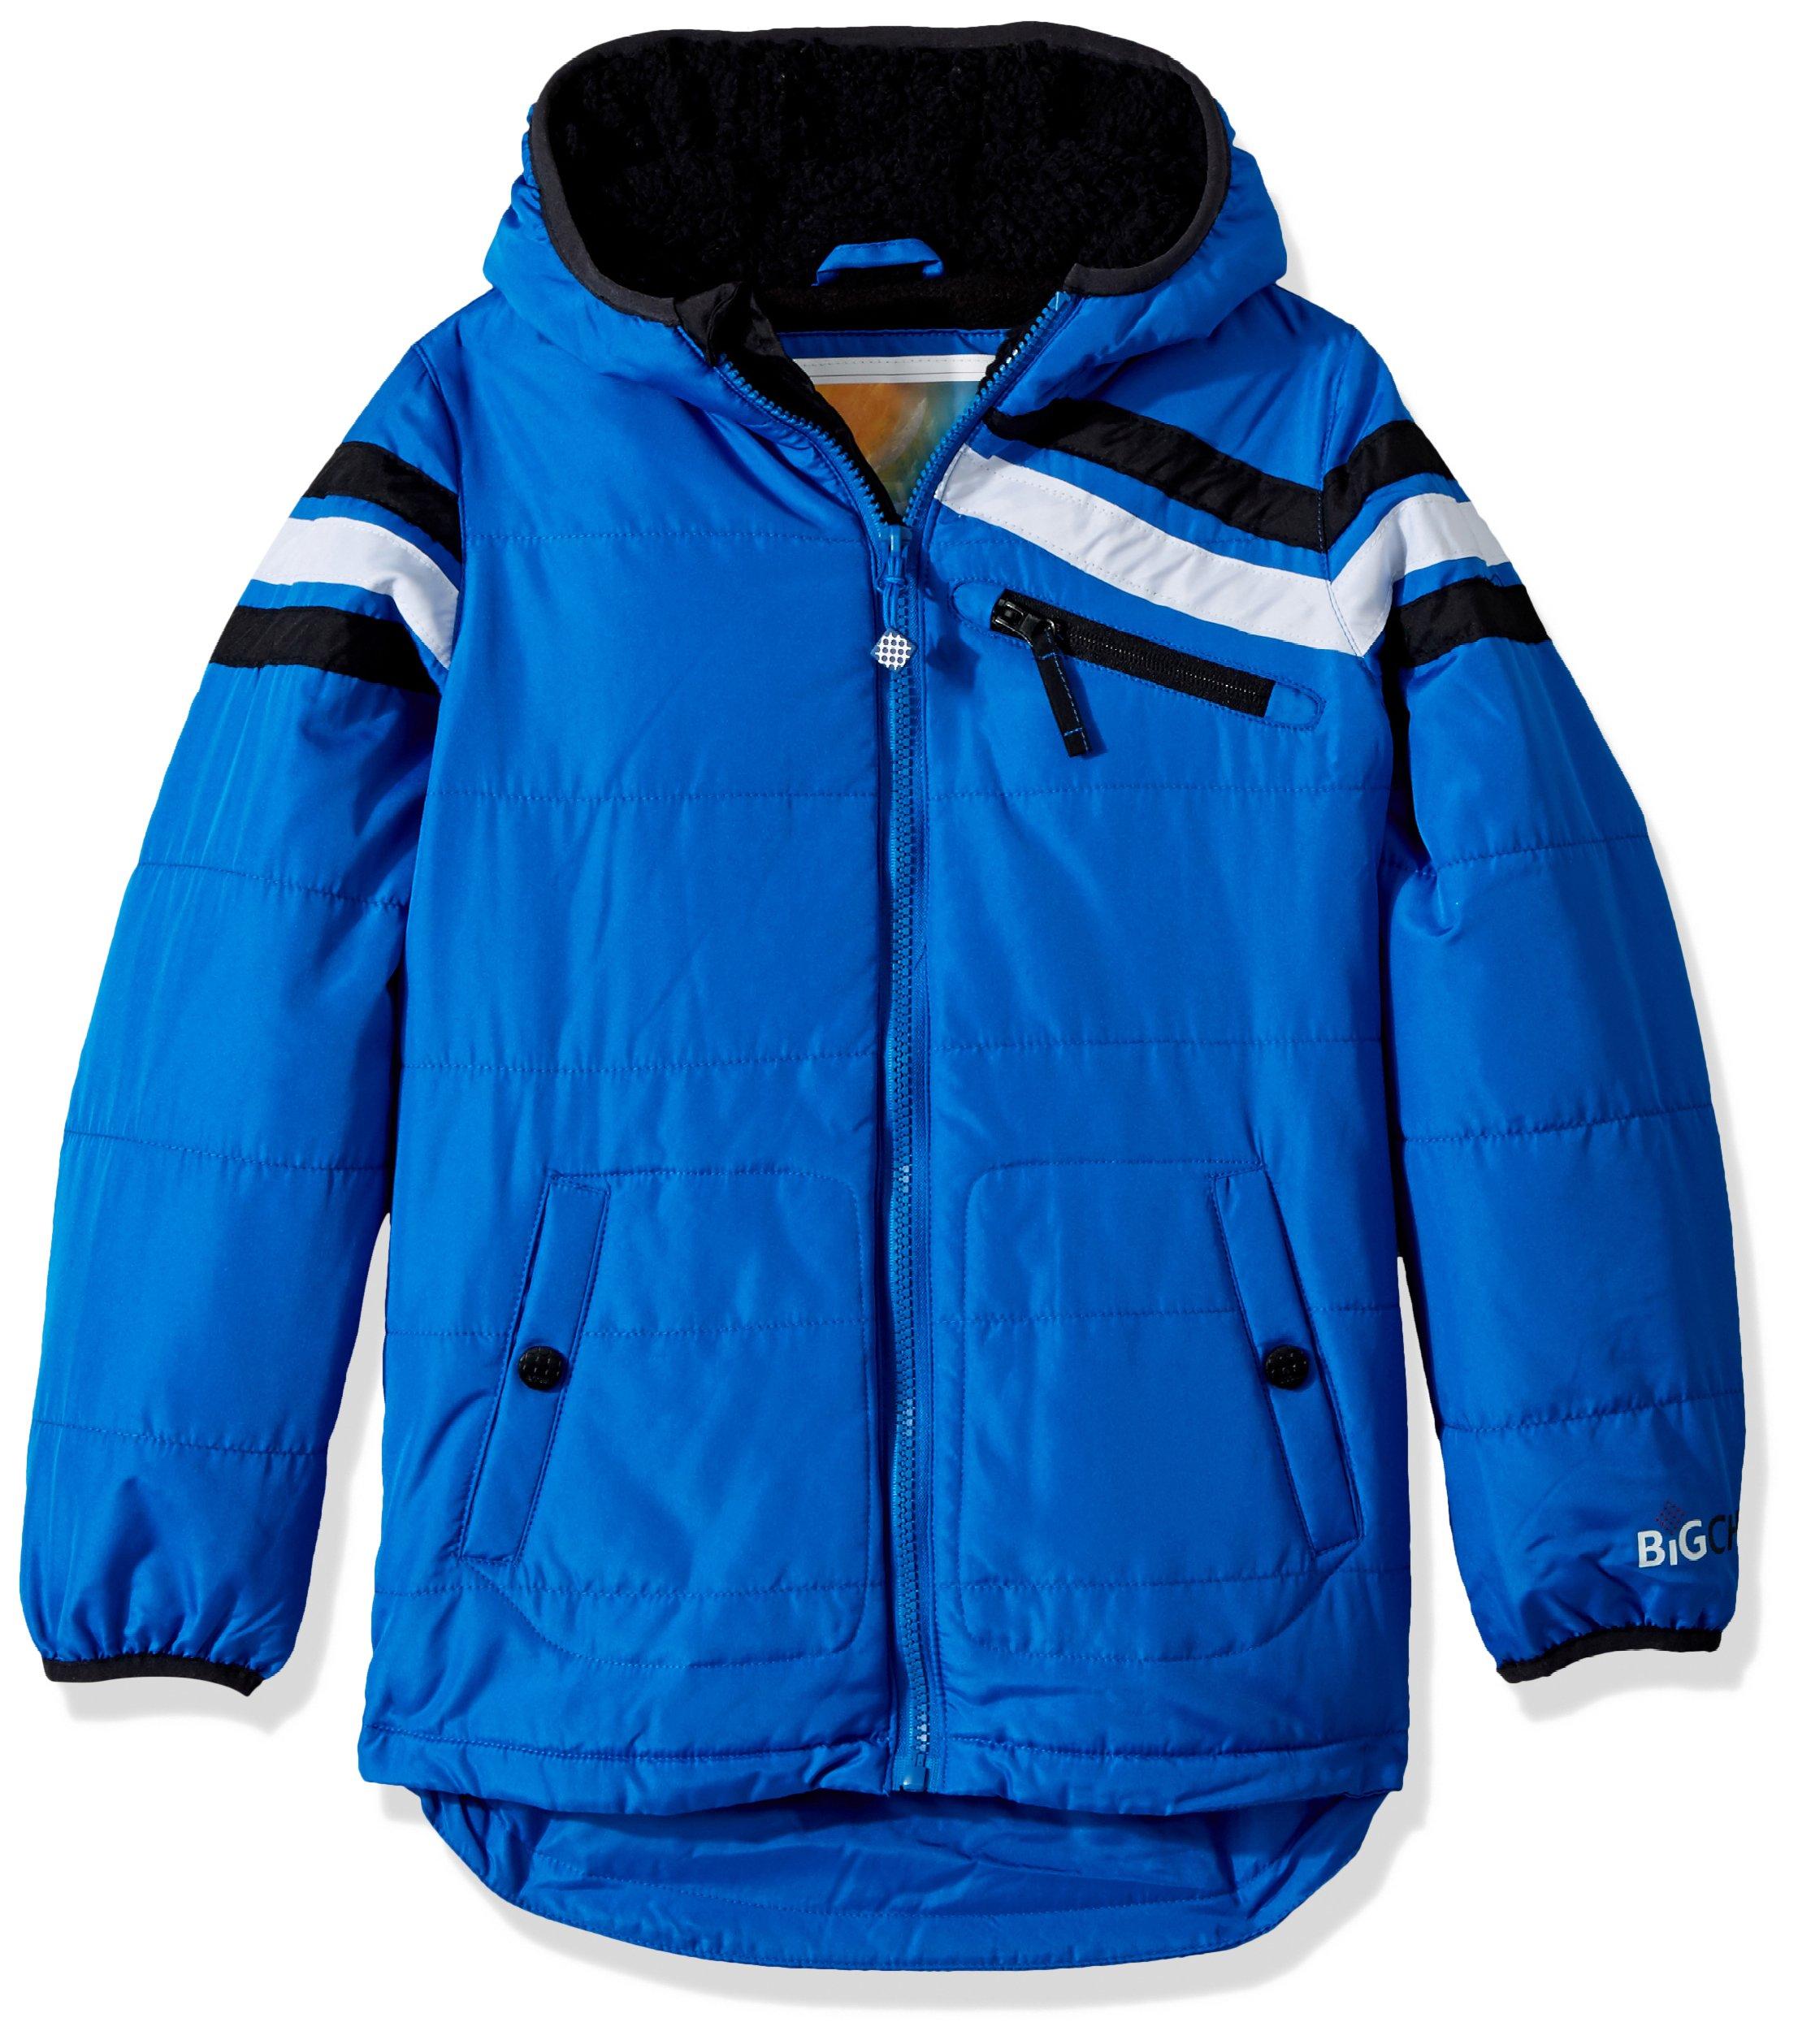 Big Chill Little Boys' Big Midweight Jacket, Blue, 5